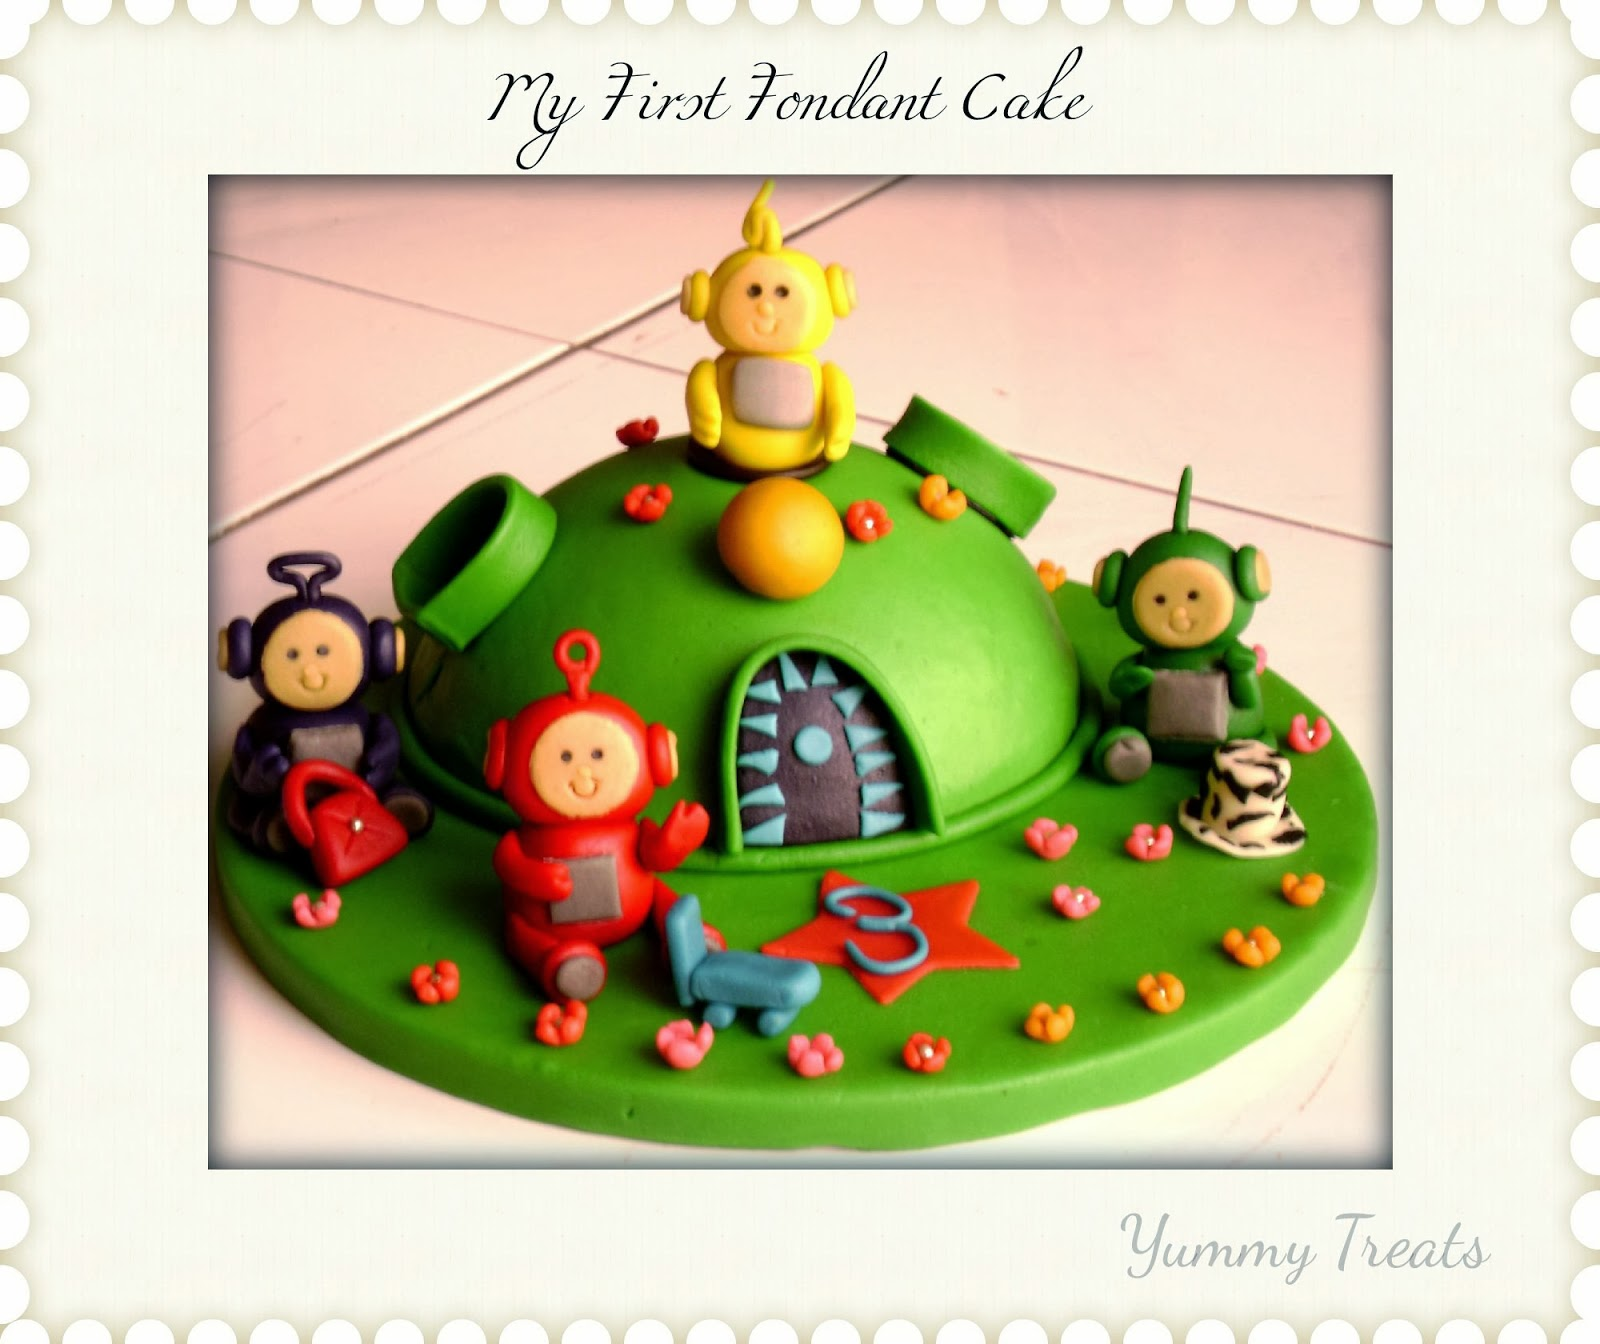 YUMMY TREATS: Themed Fondant Cake (Teletubbies